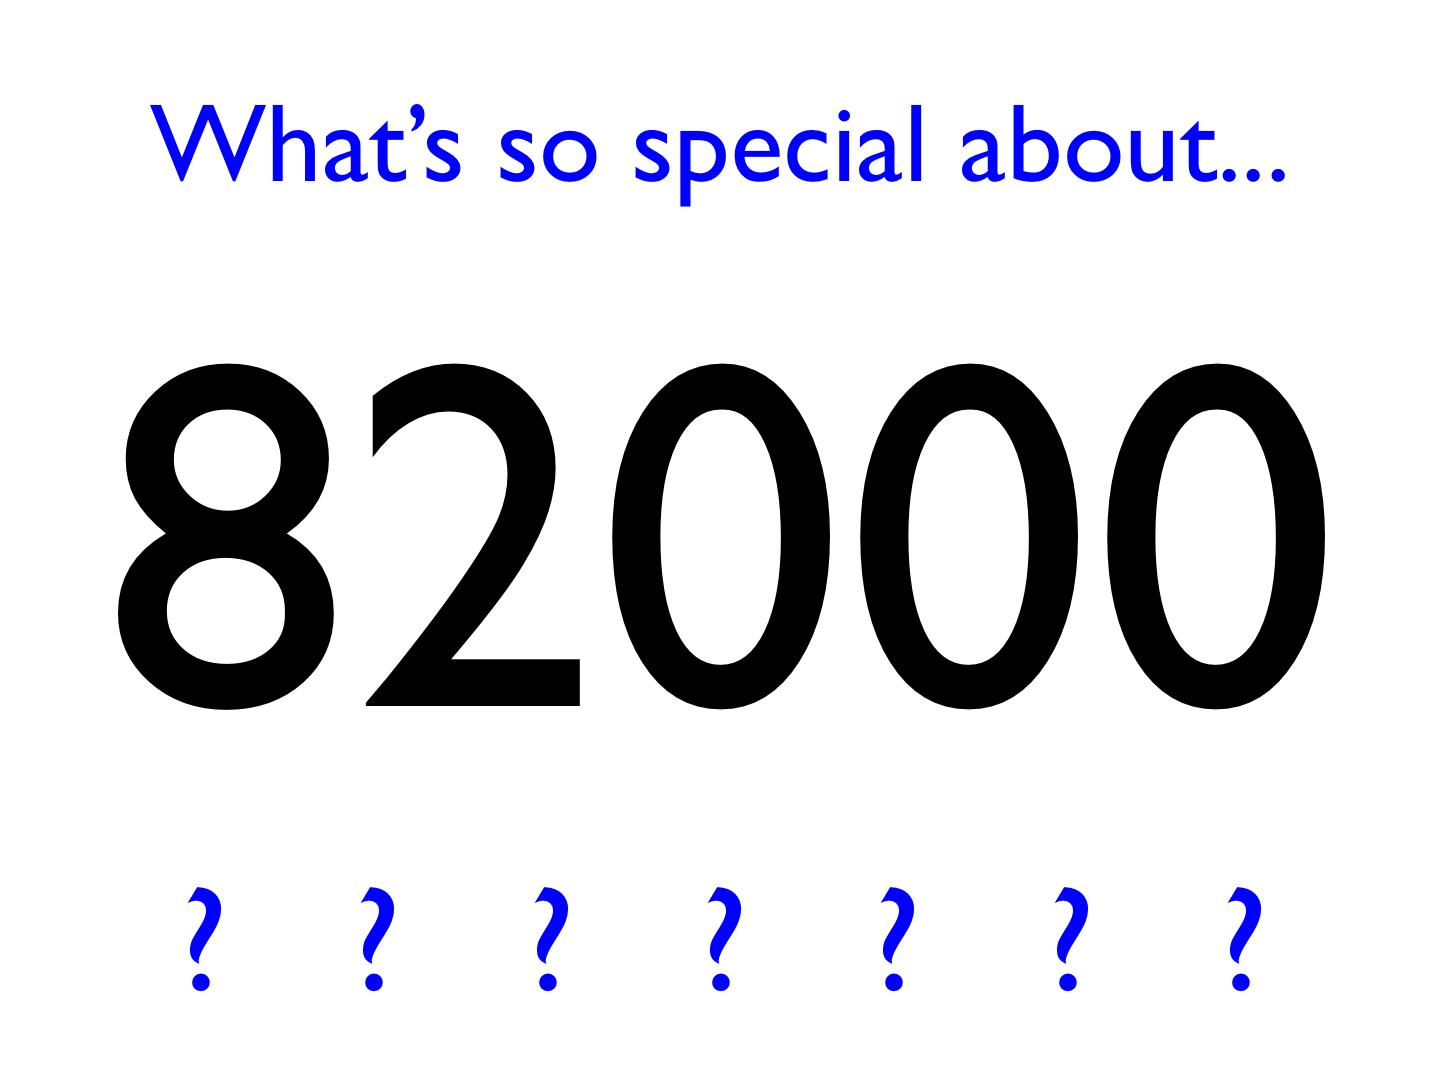 Special 82000